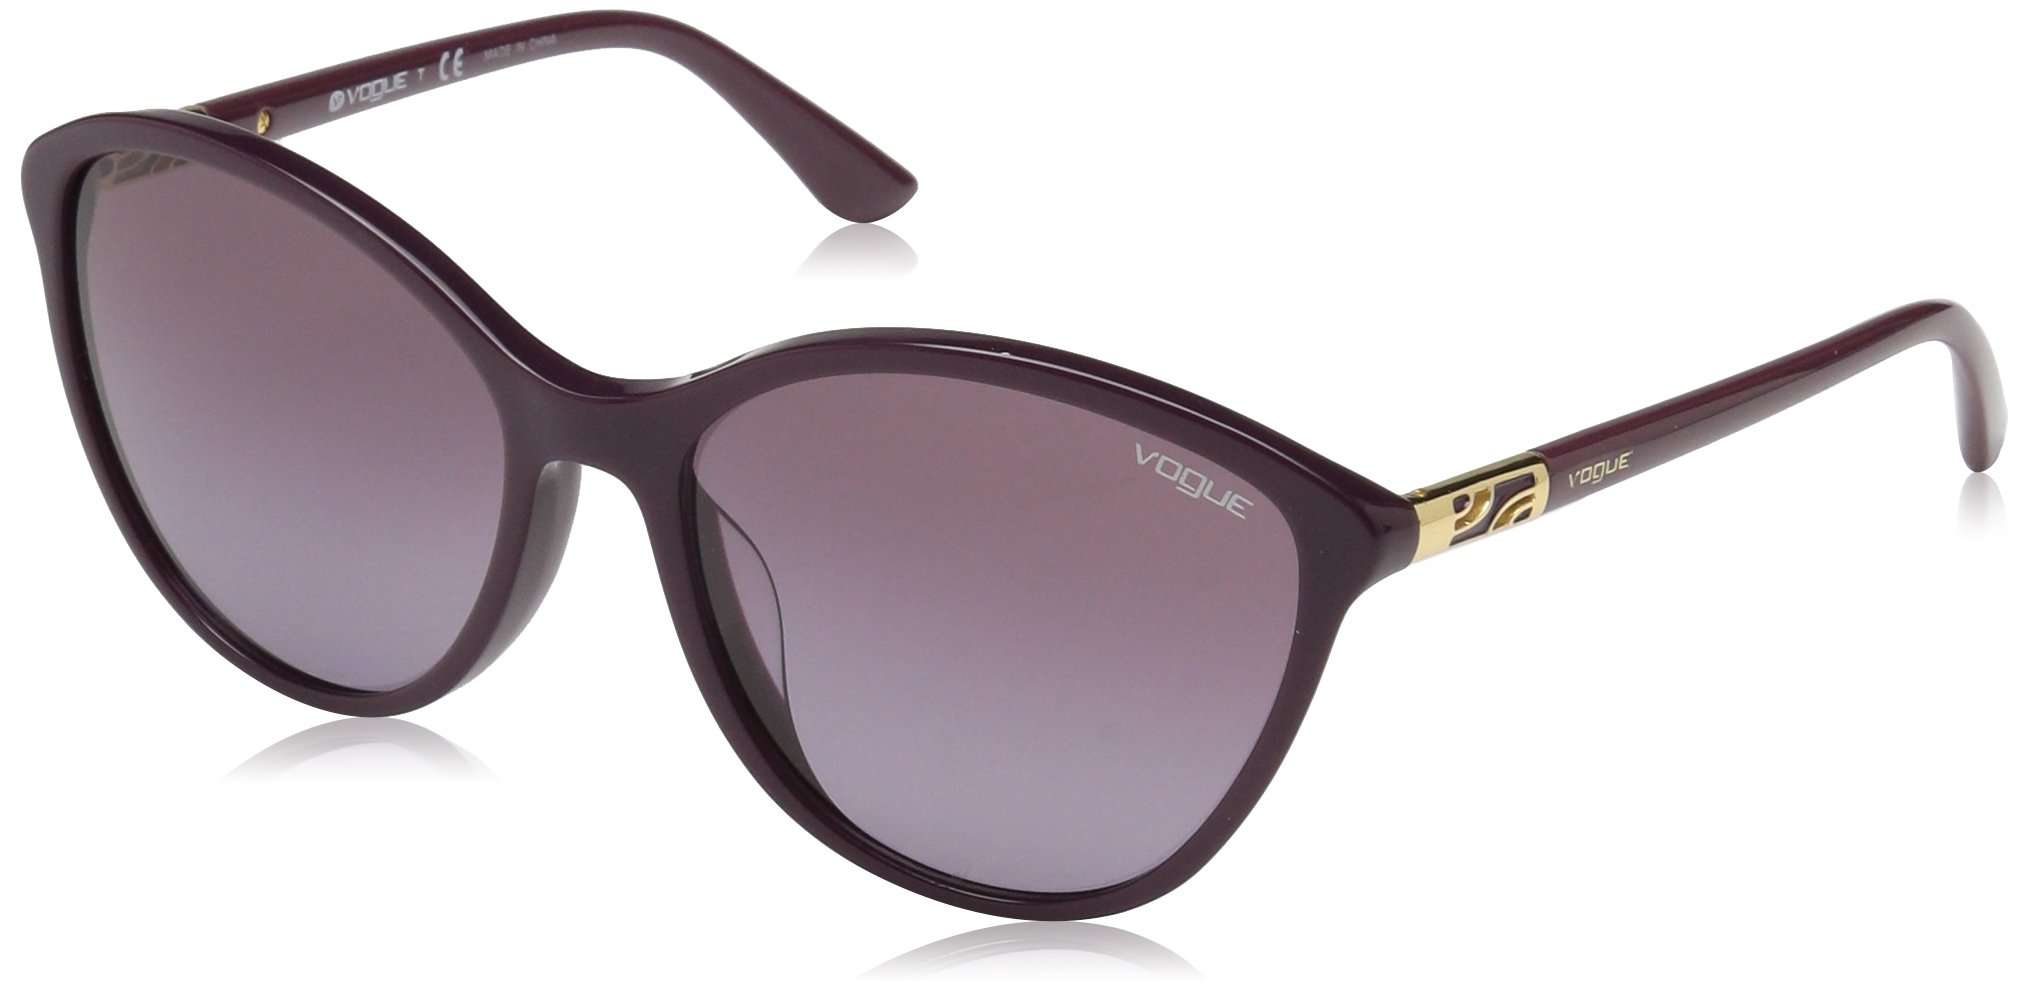 Ray-Ban Women's Plastic Woman Cateye Sunglasses, Red Purple, 57 mm